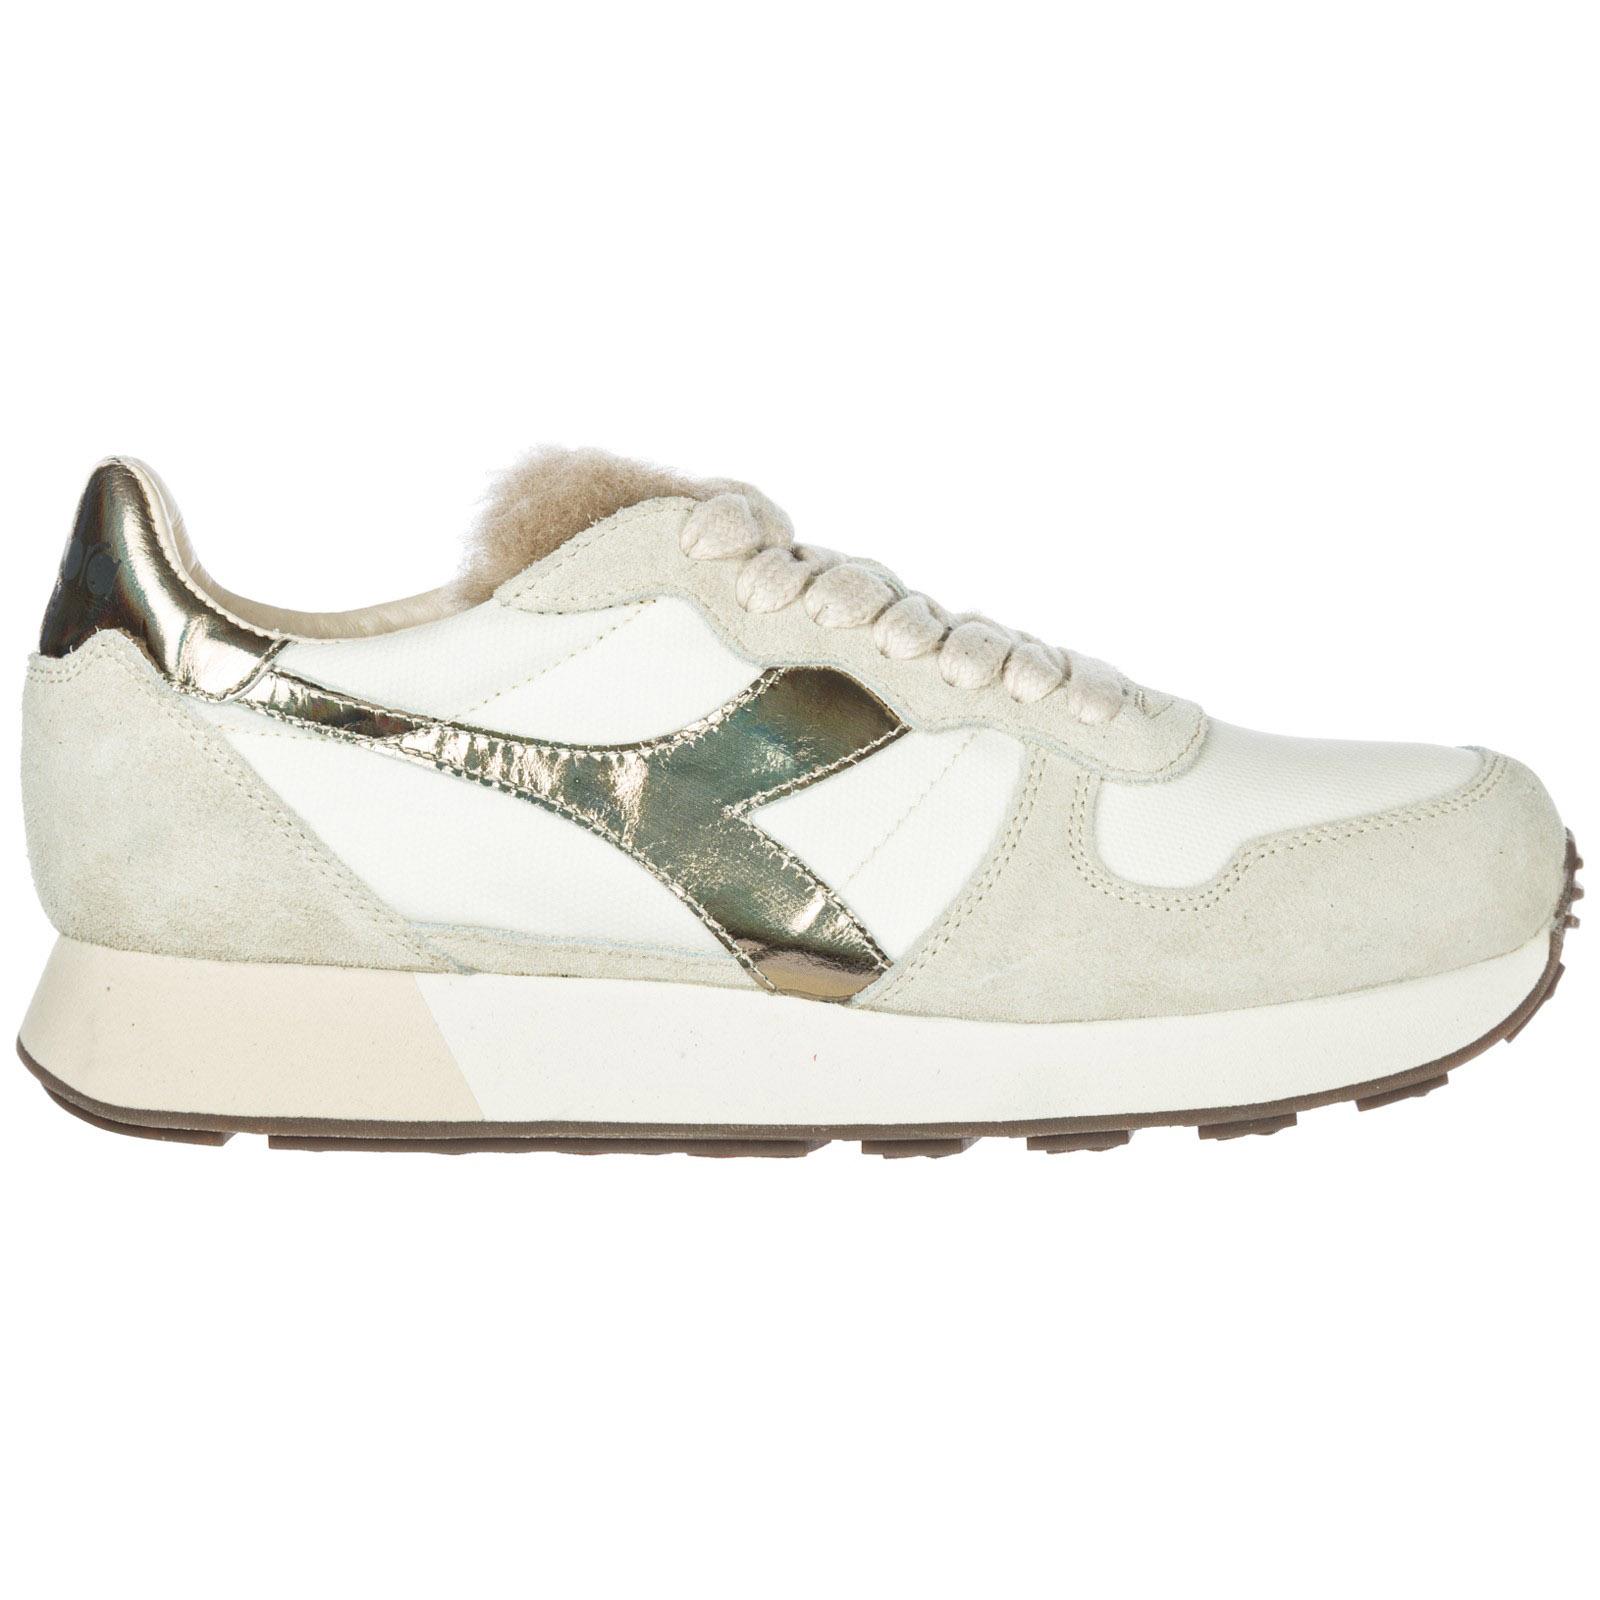 201 173894 Diadora Heritage Beige Fog Sneakers qZn0ECWc0